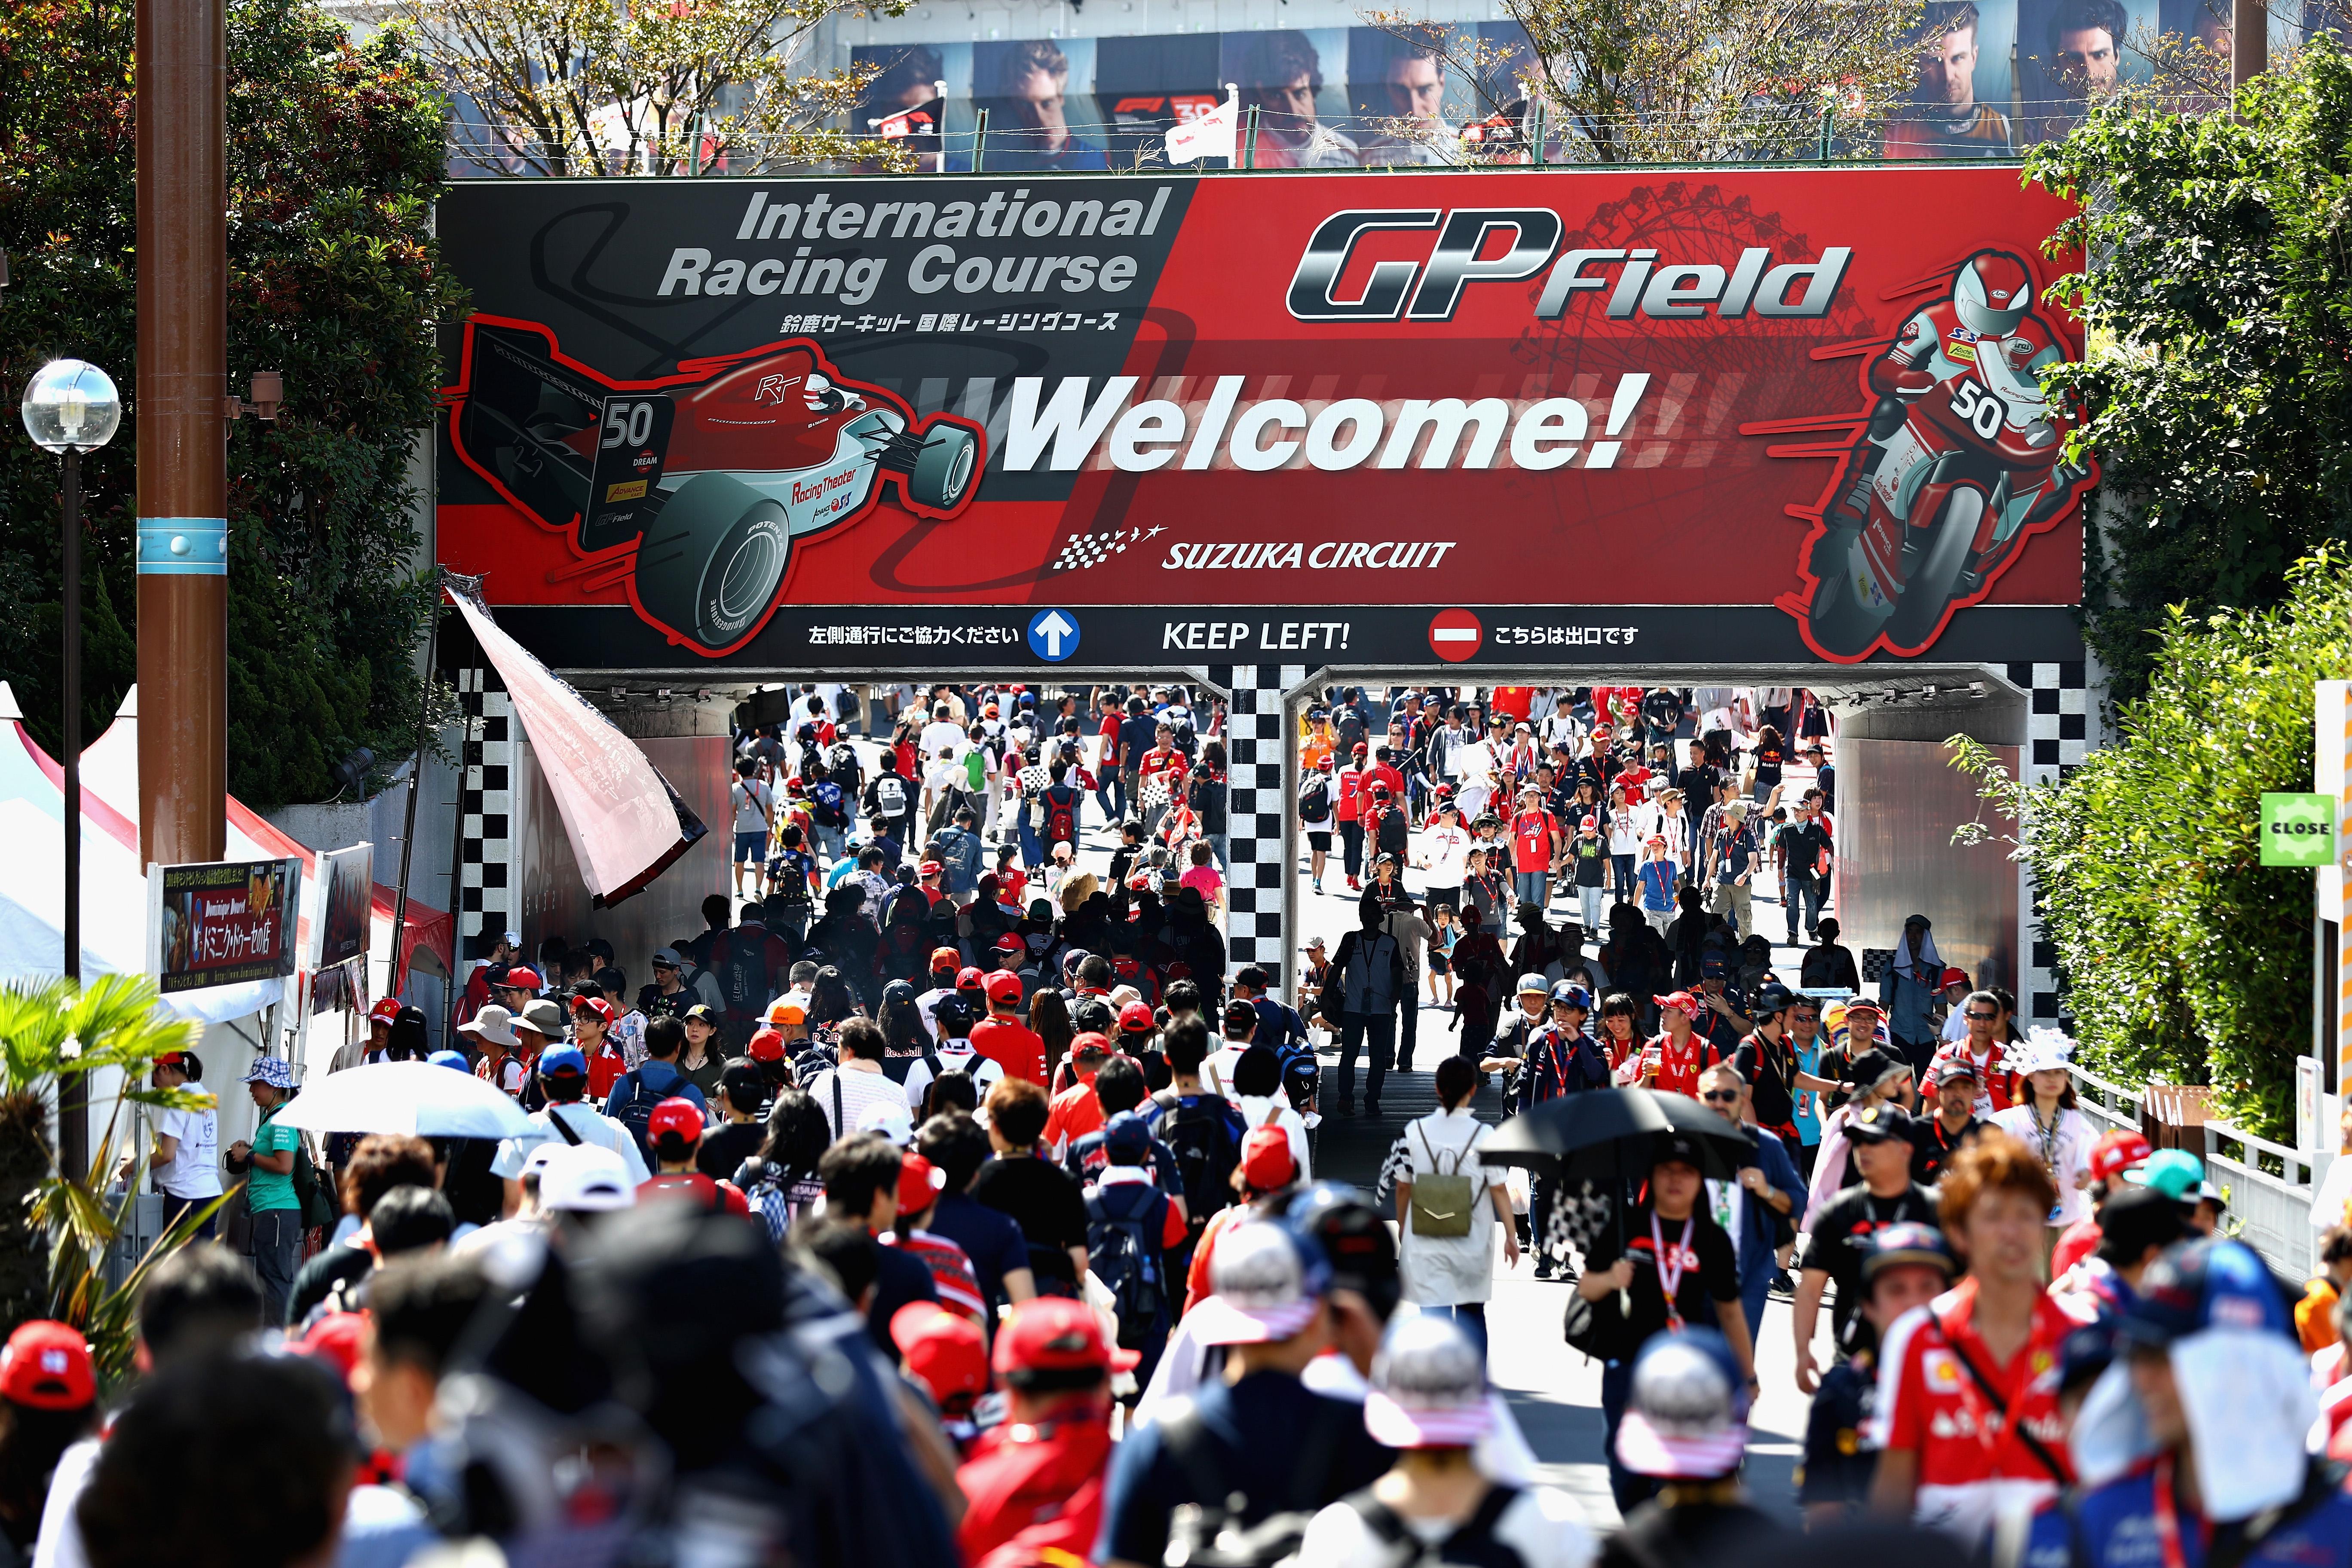 Imola hopes spectators can attend April race